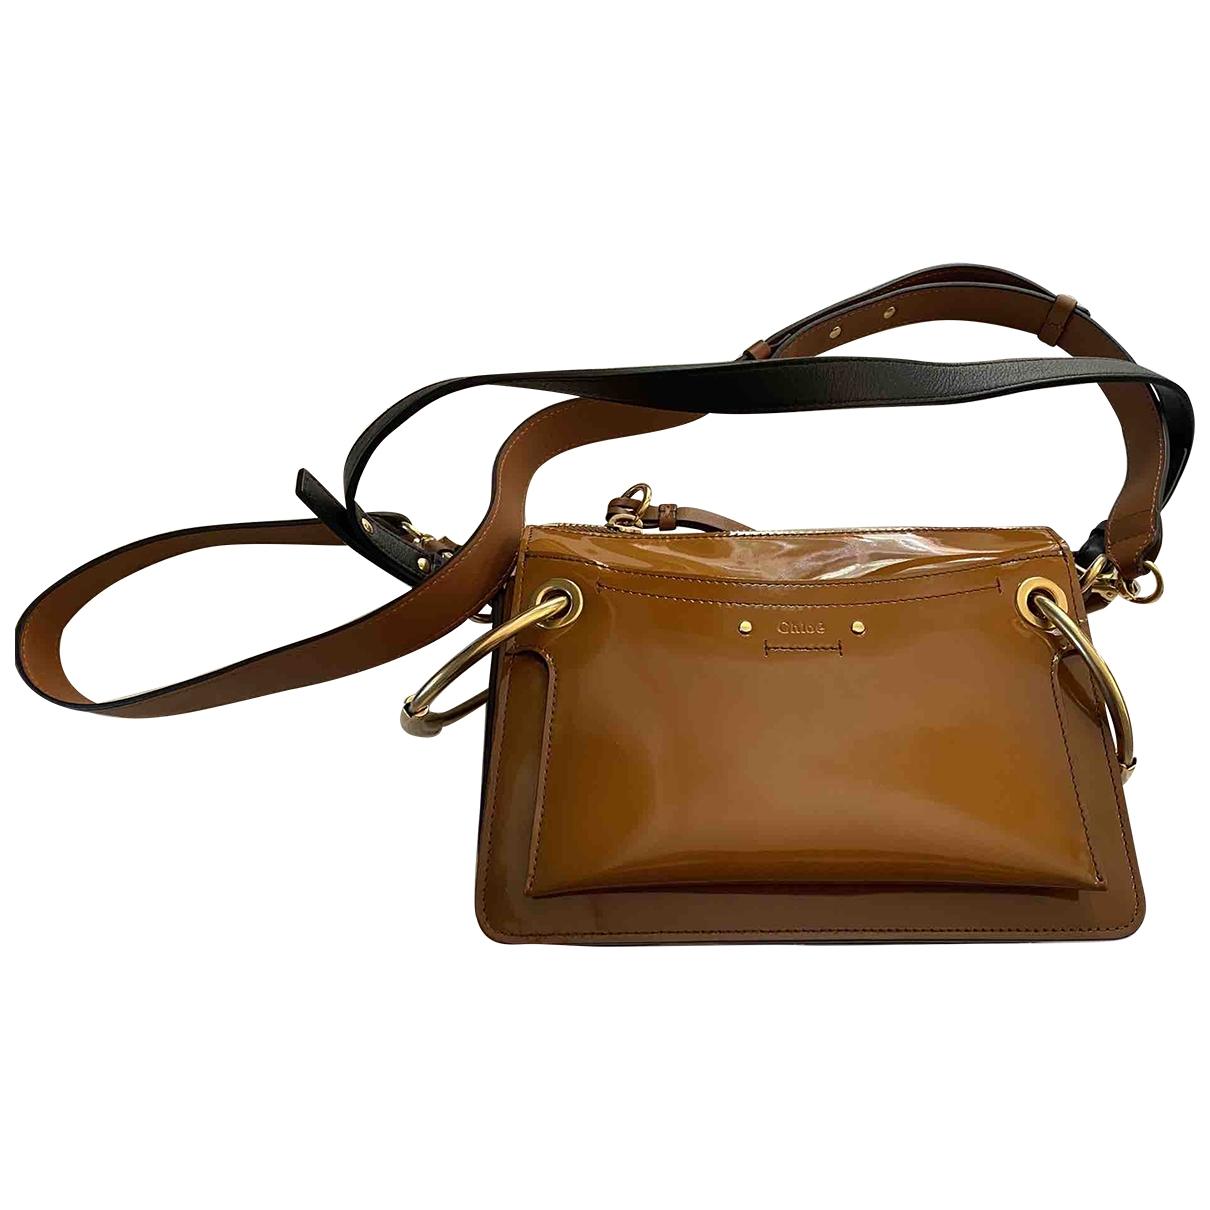 Chloé Roy Brown Patent leather handbag for Women \N